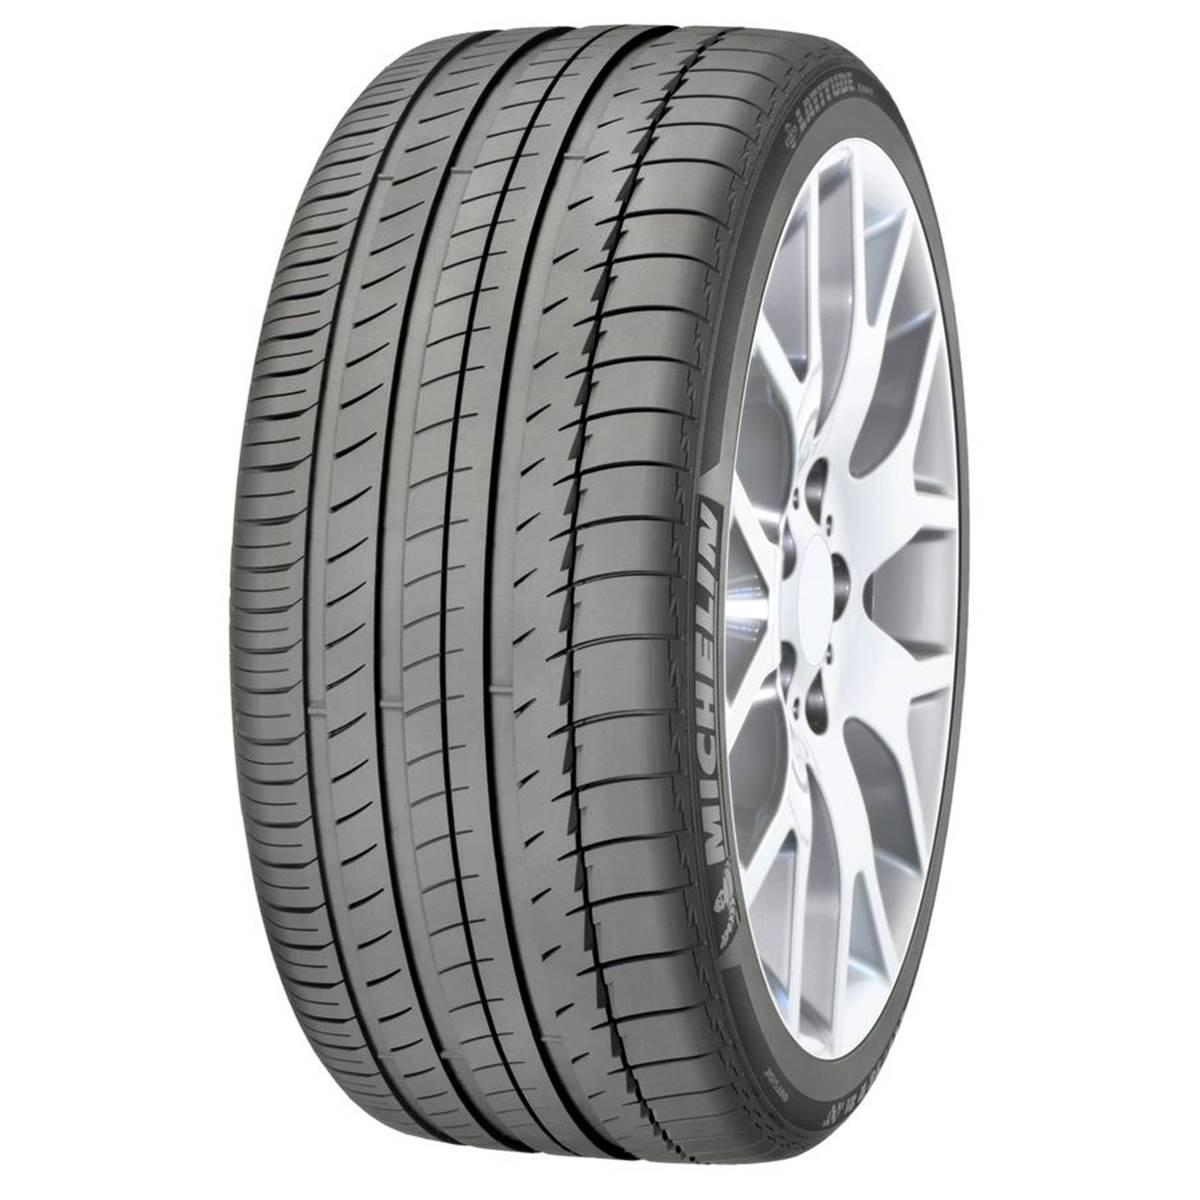 Pneu 4X4 Michelin 255/60R17 106V Latitude Sport 3